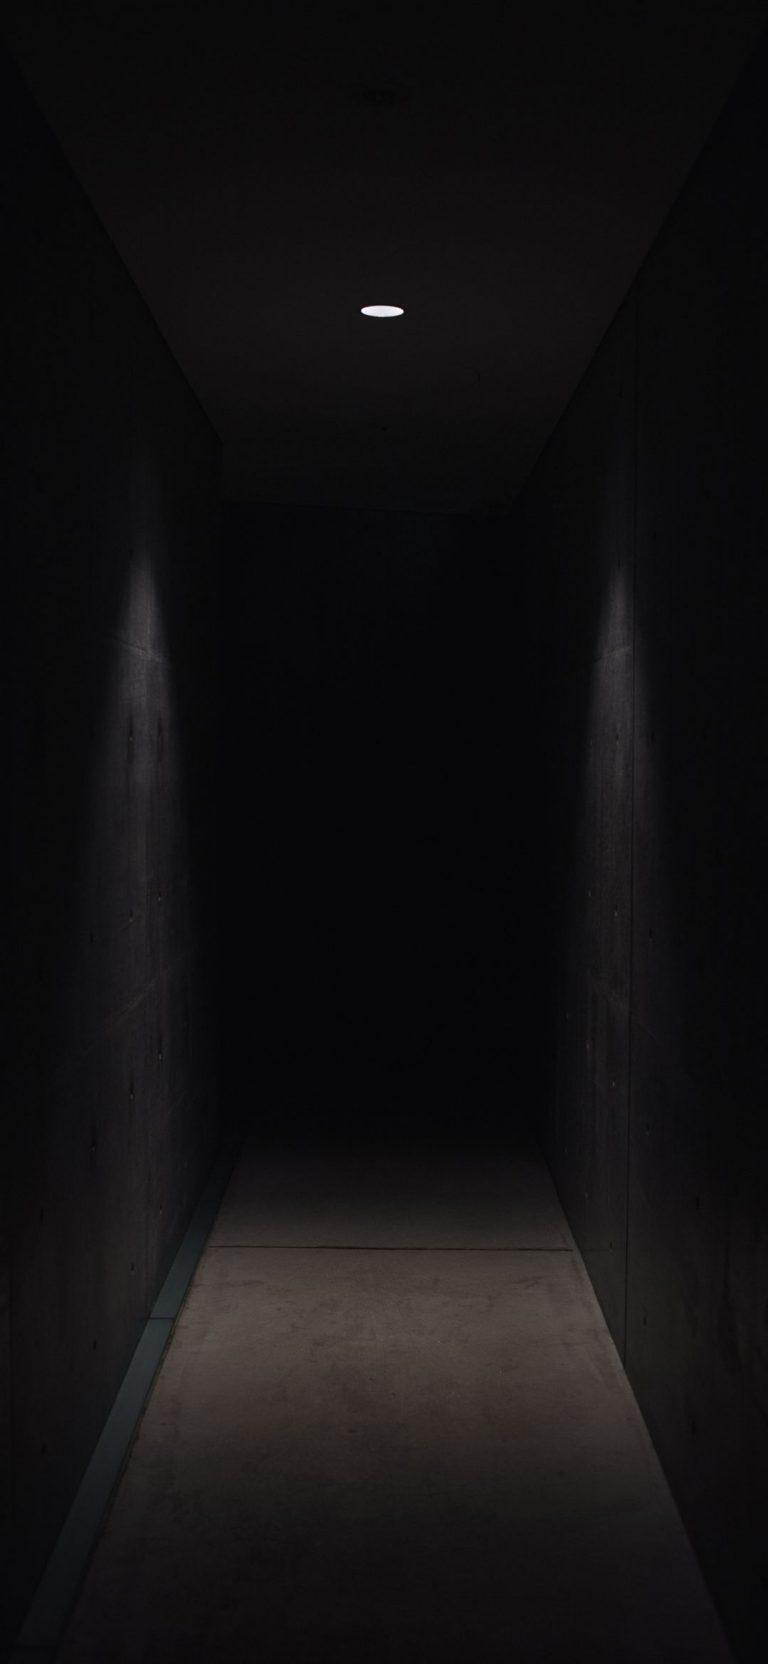 Dark Phone Wallpaper 082 1080x2340 768x1664